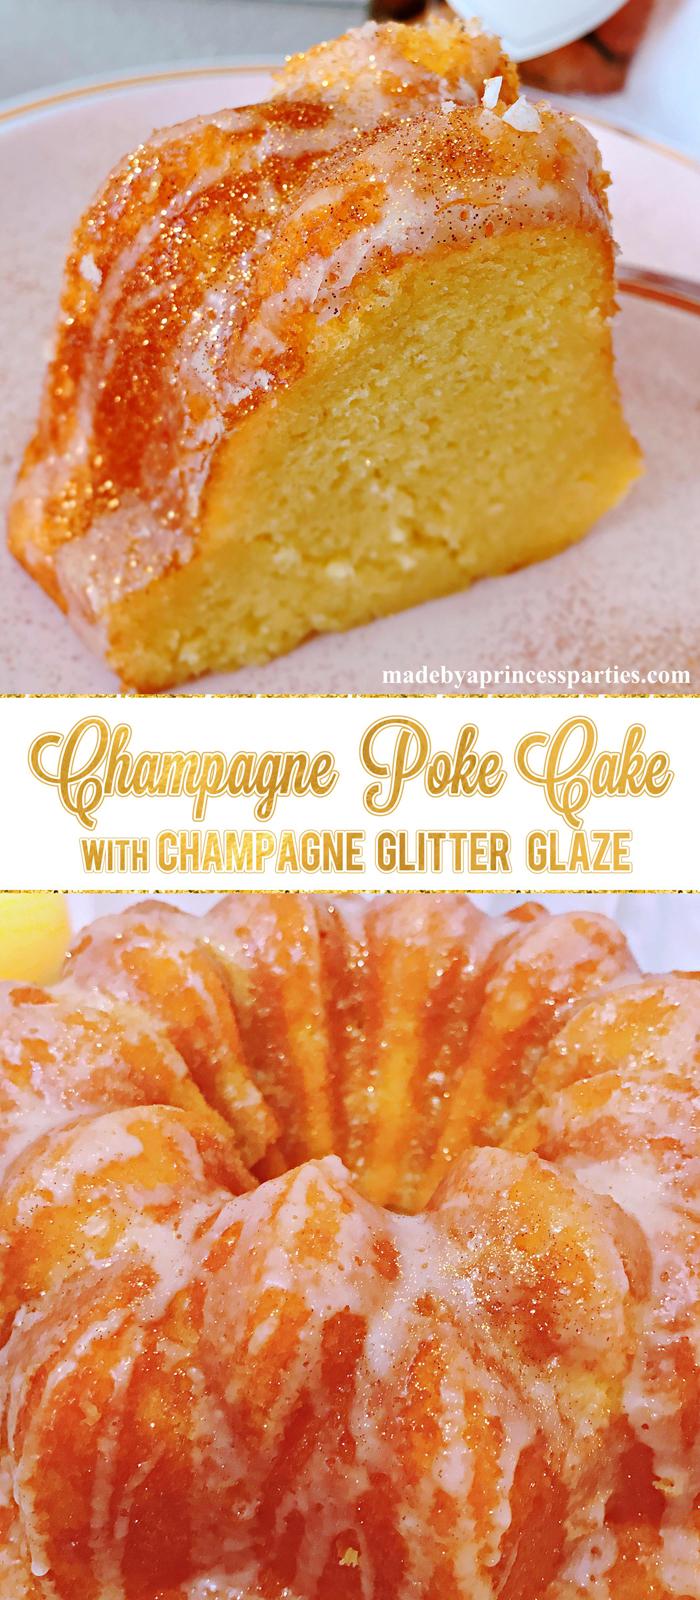 Champagne Poke Cake with Decadent Champagne Glitter Glaze